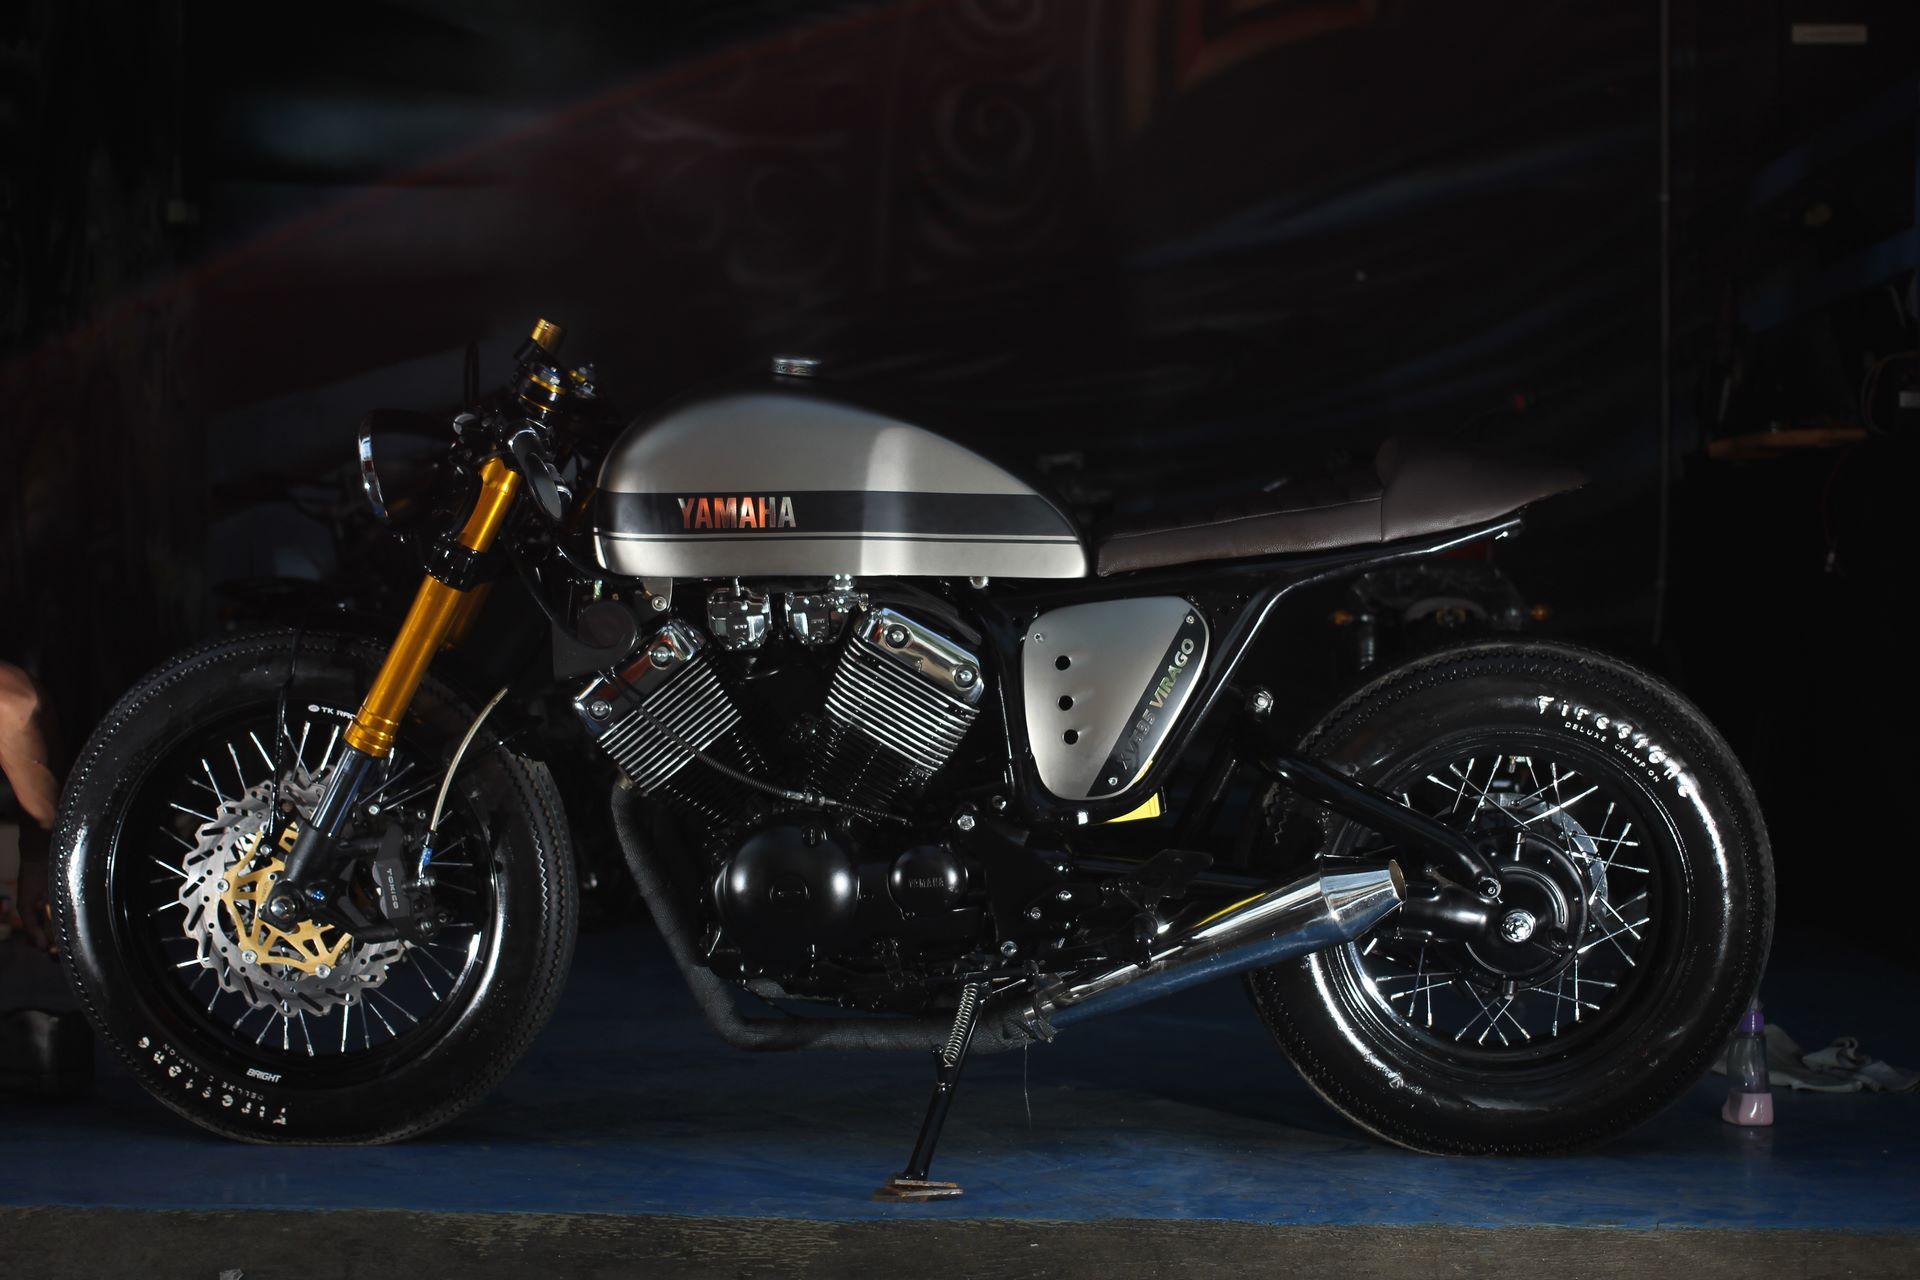 Yamaha Virago 535 The Clyro Cafe Racer Studio Motoron Yamaha Virago 535